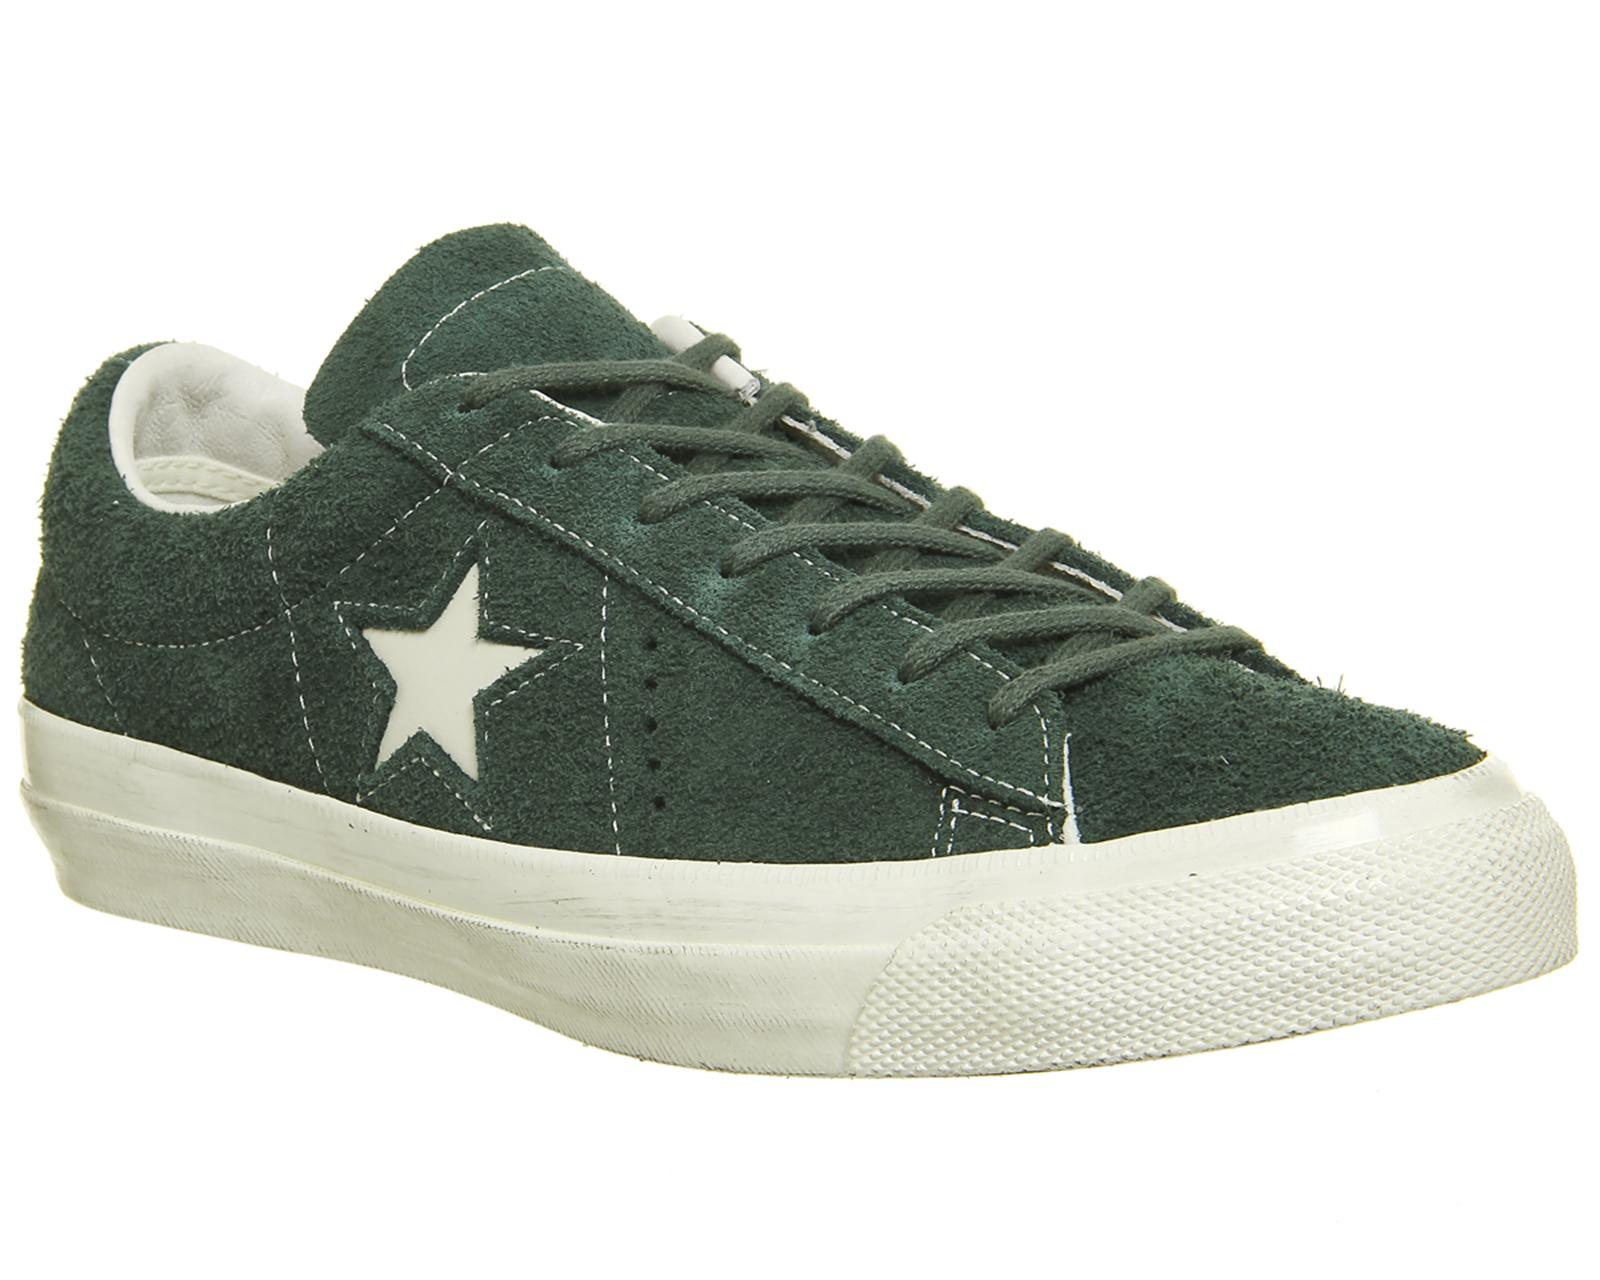 72b24ebd84497b ... dtlr villa c72d0 edff0  order converse. womens green one star trainers  7ae0b 7dacd